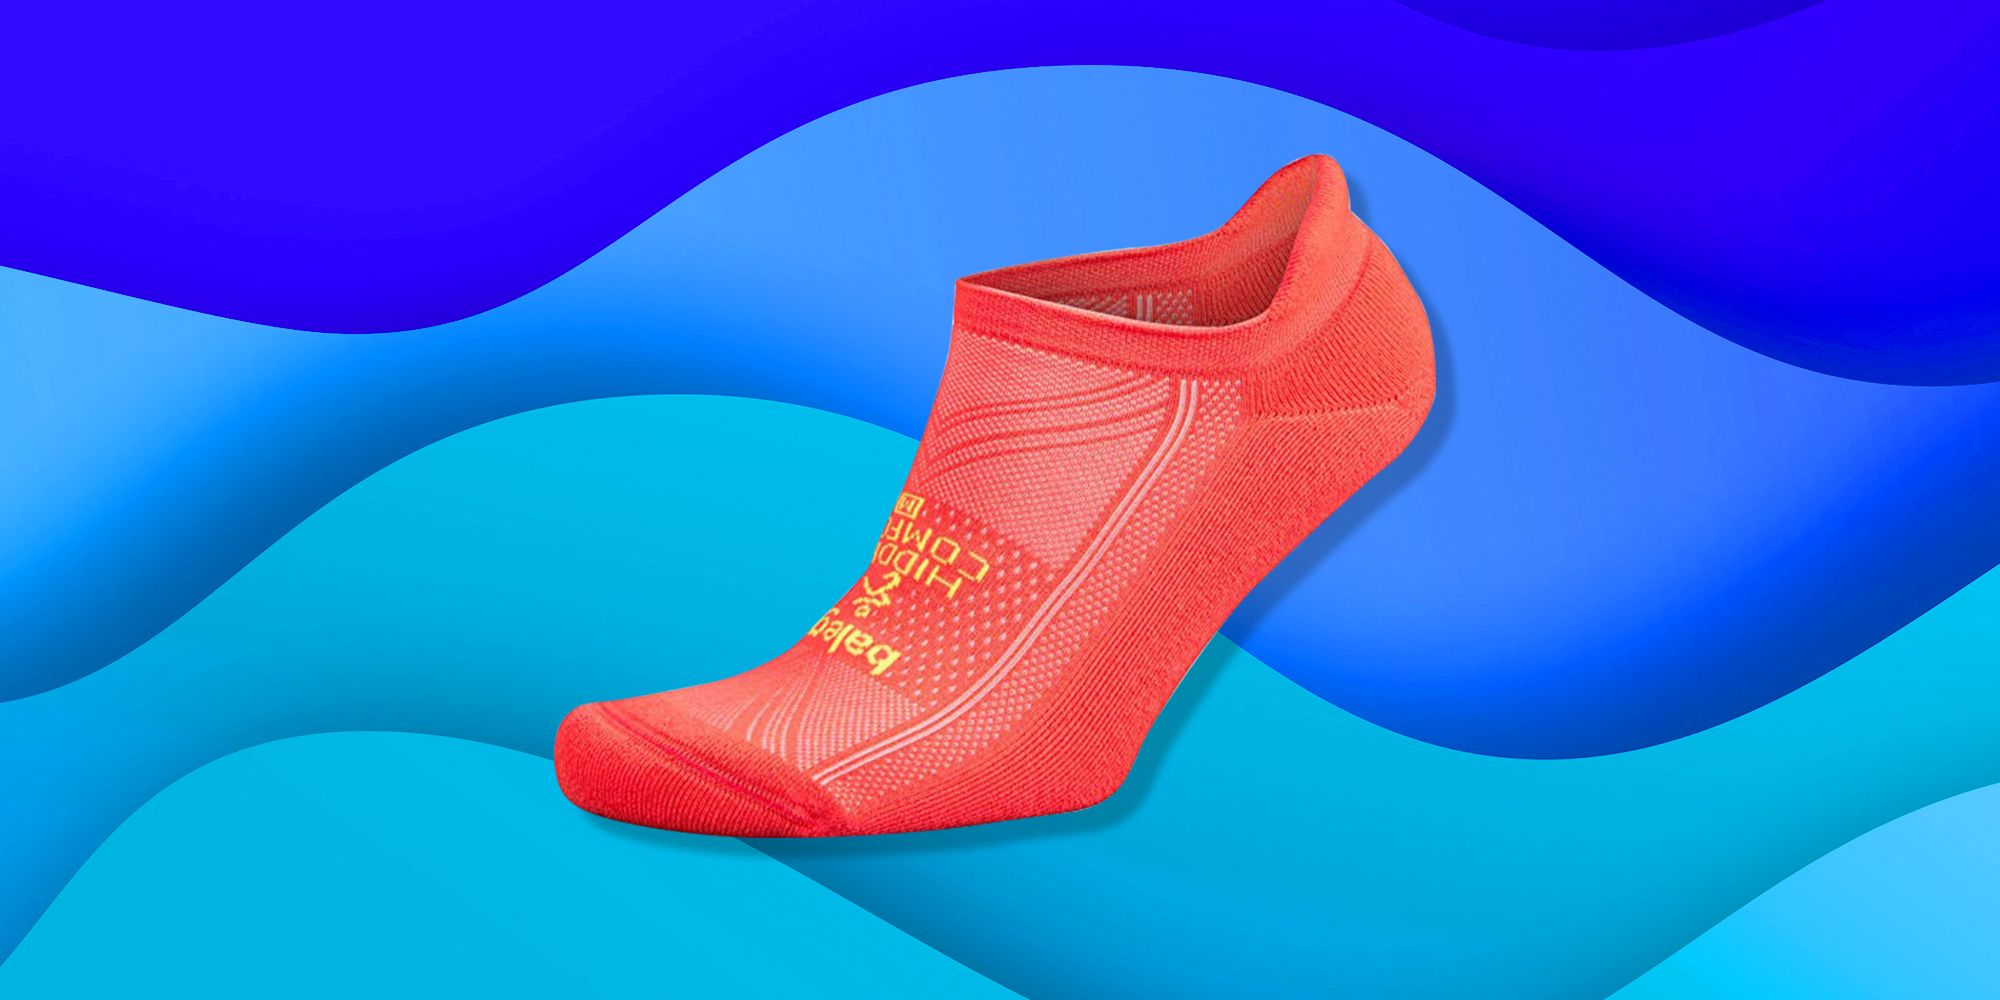 Balega's No-Show Running Socks Have More Than 2,000 Positive Amazon Reviews